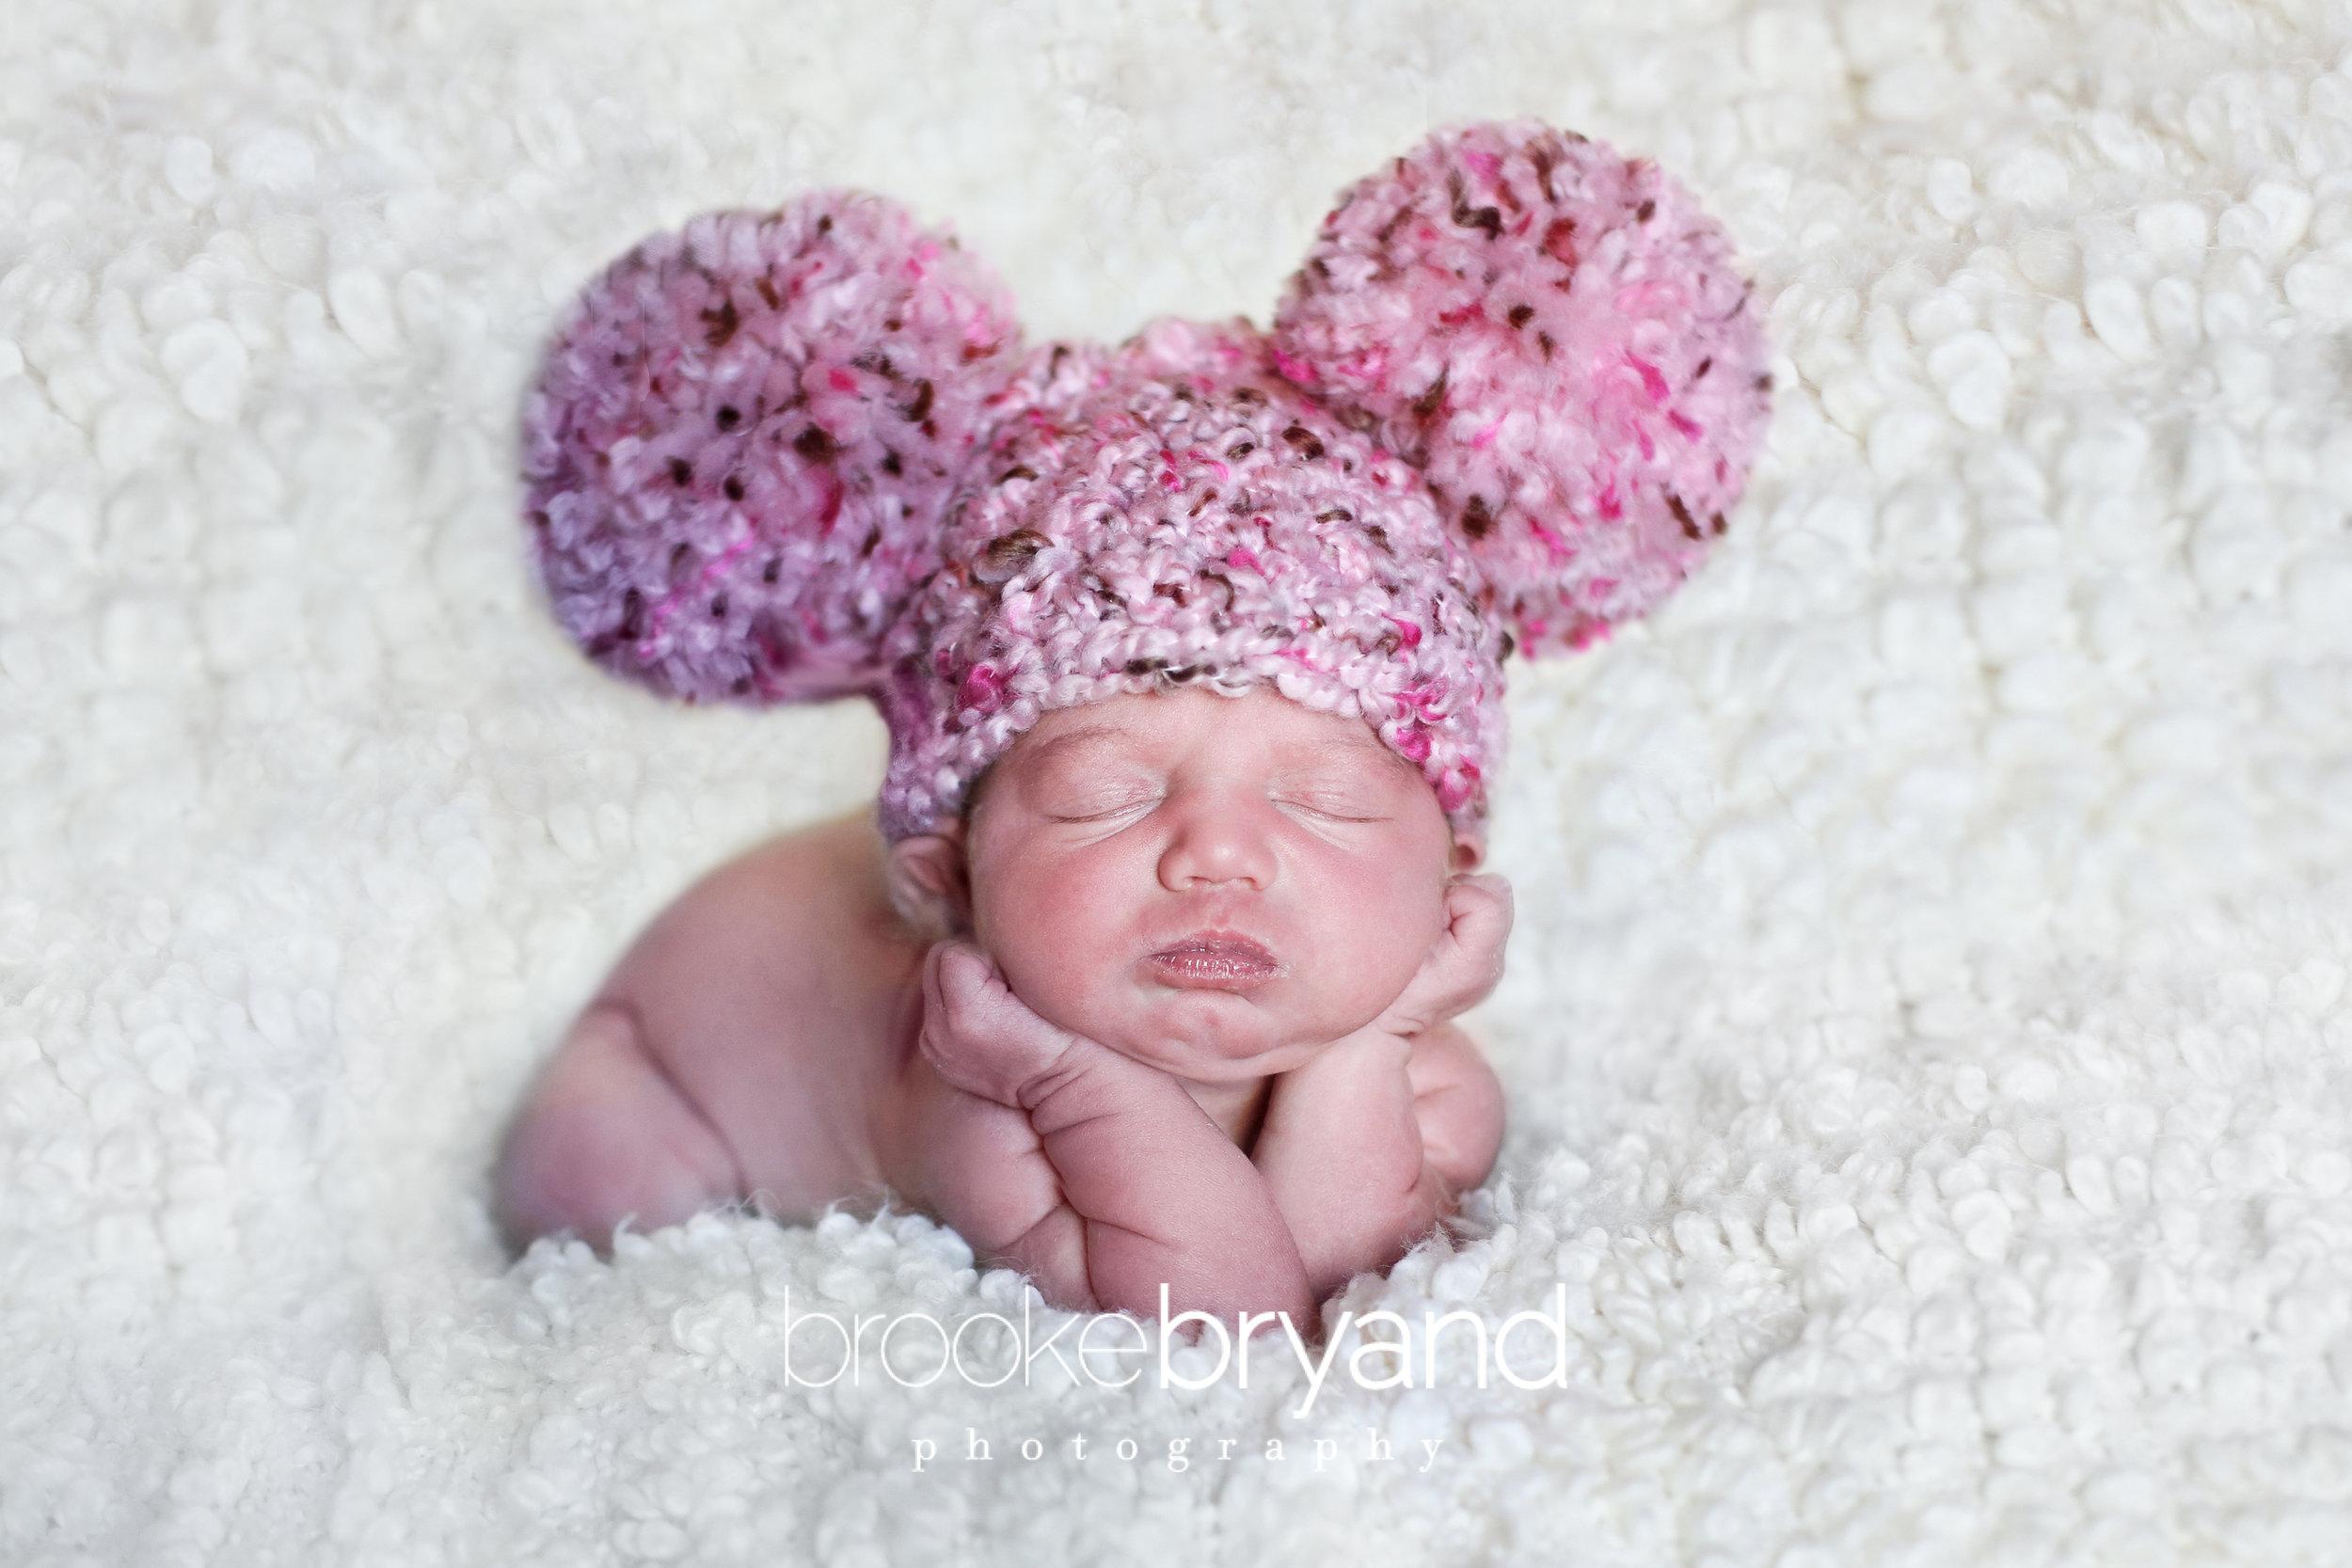 Brooke-Bryand-Photography-San-Francisco-Newborn-Photographer-IMG_1188_retouch2.jpg